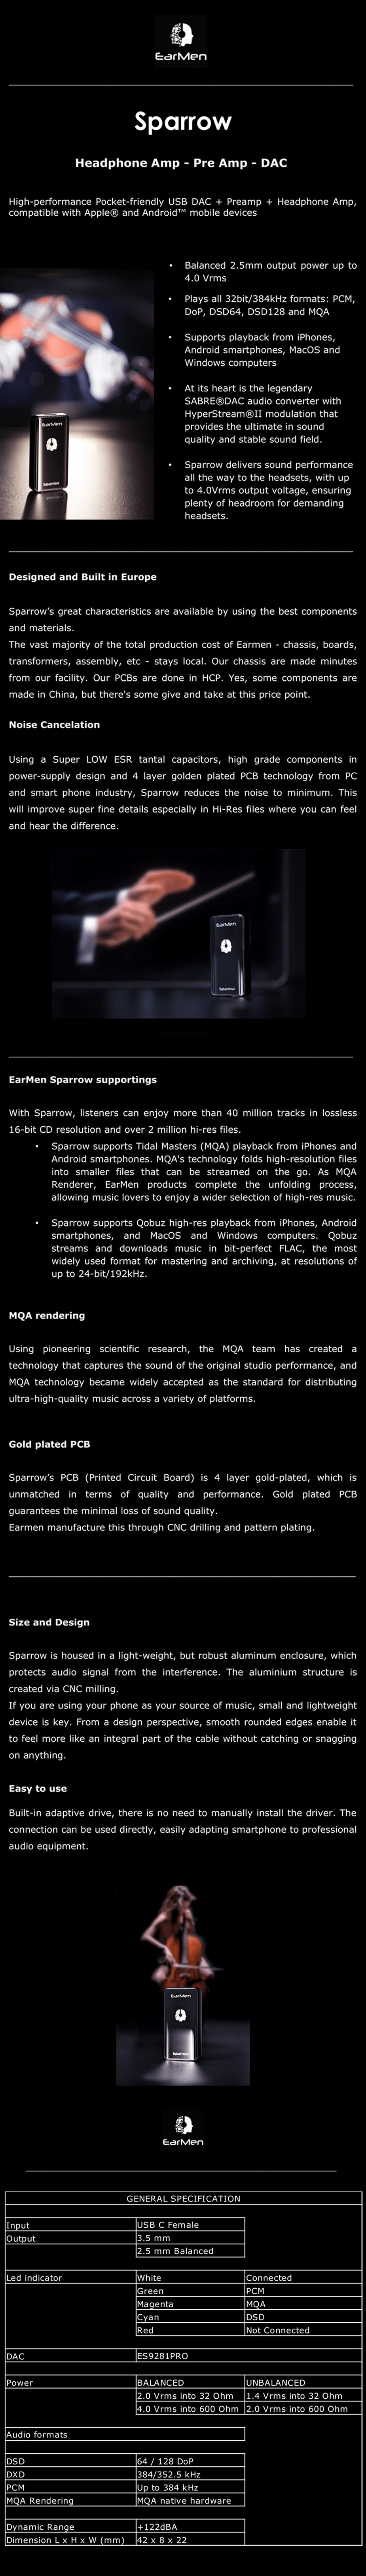 EarMen Sparrow Preamp Headphone AMP - USB DAC - Overview 1